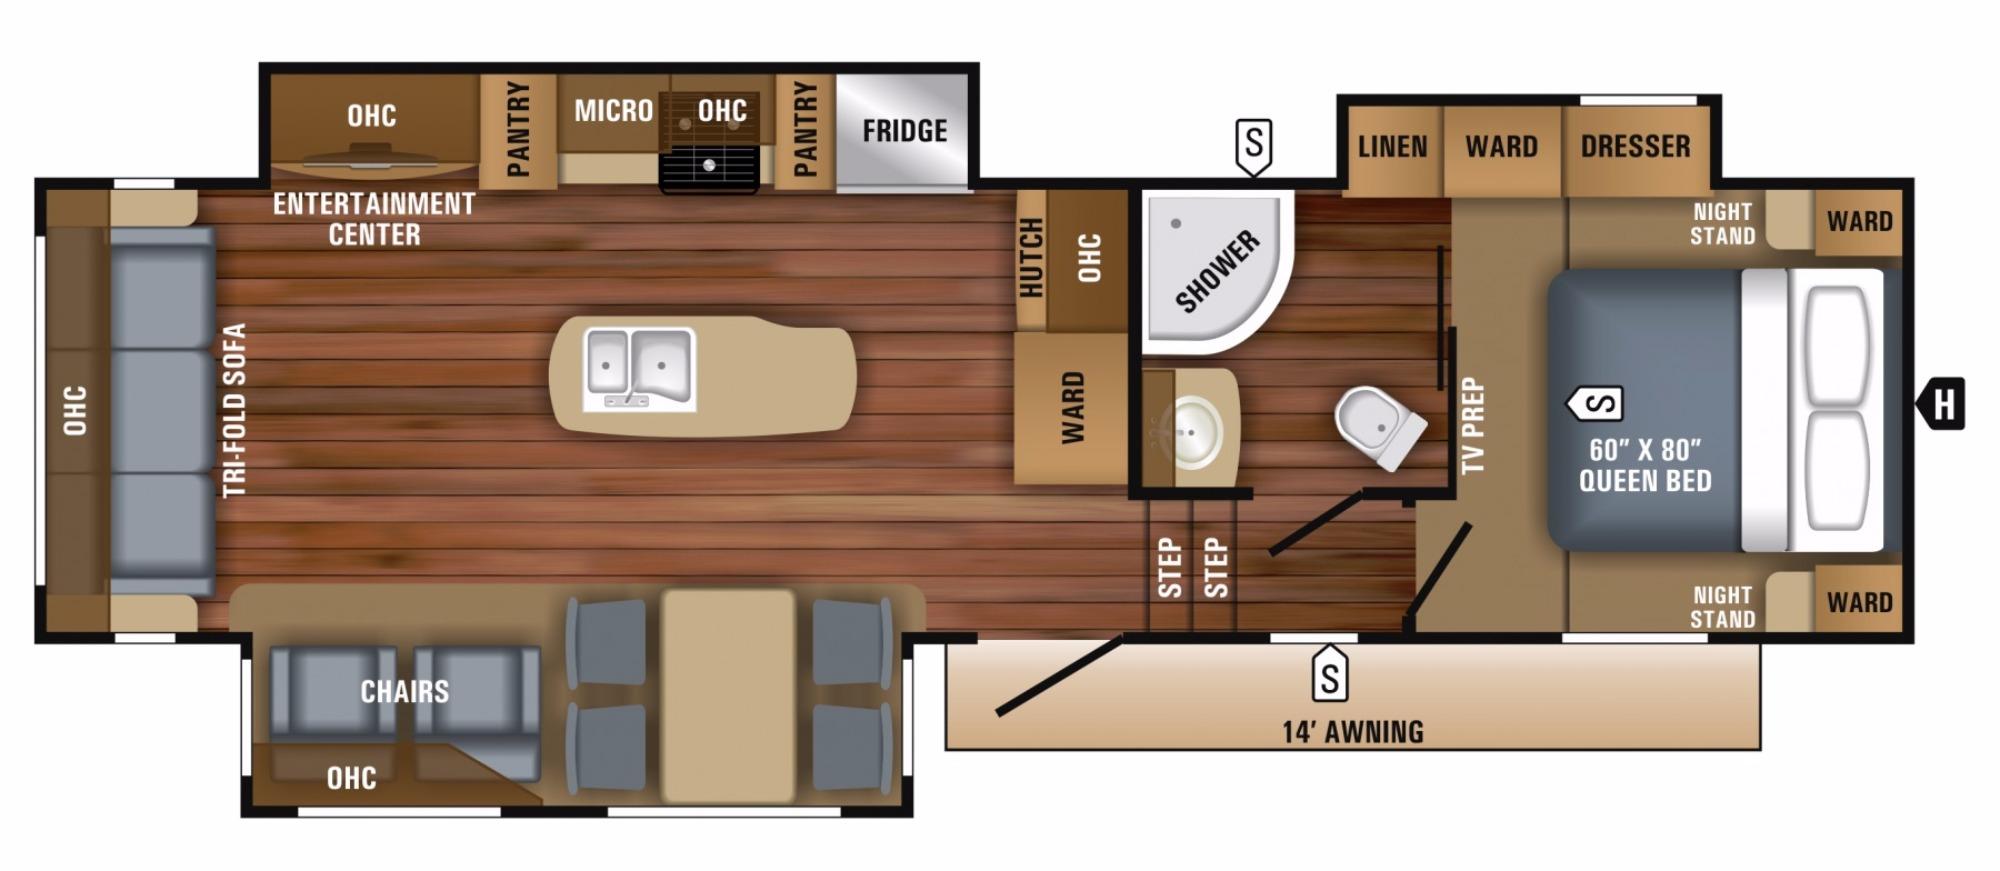 View Floor Plan for 2018 JAYCO EAGLE HT 30.5CKTS